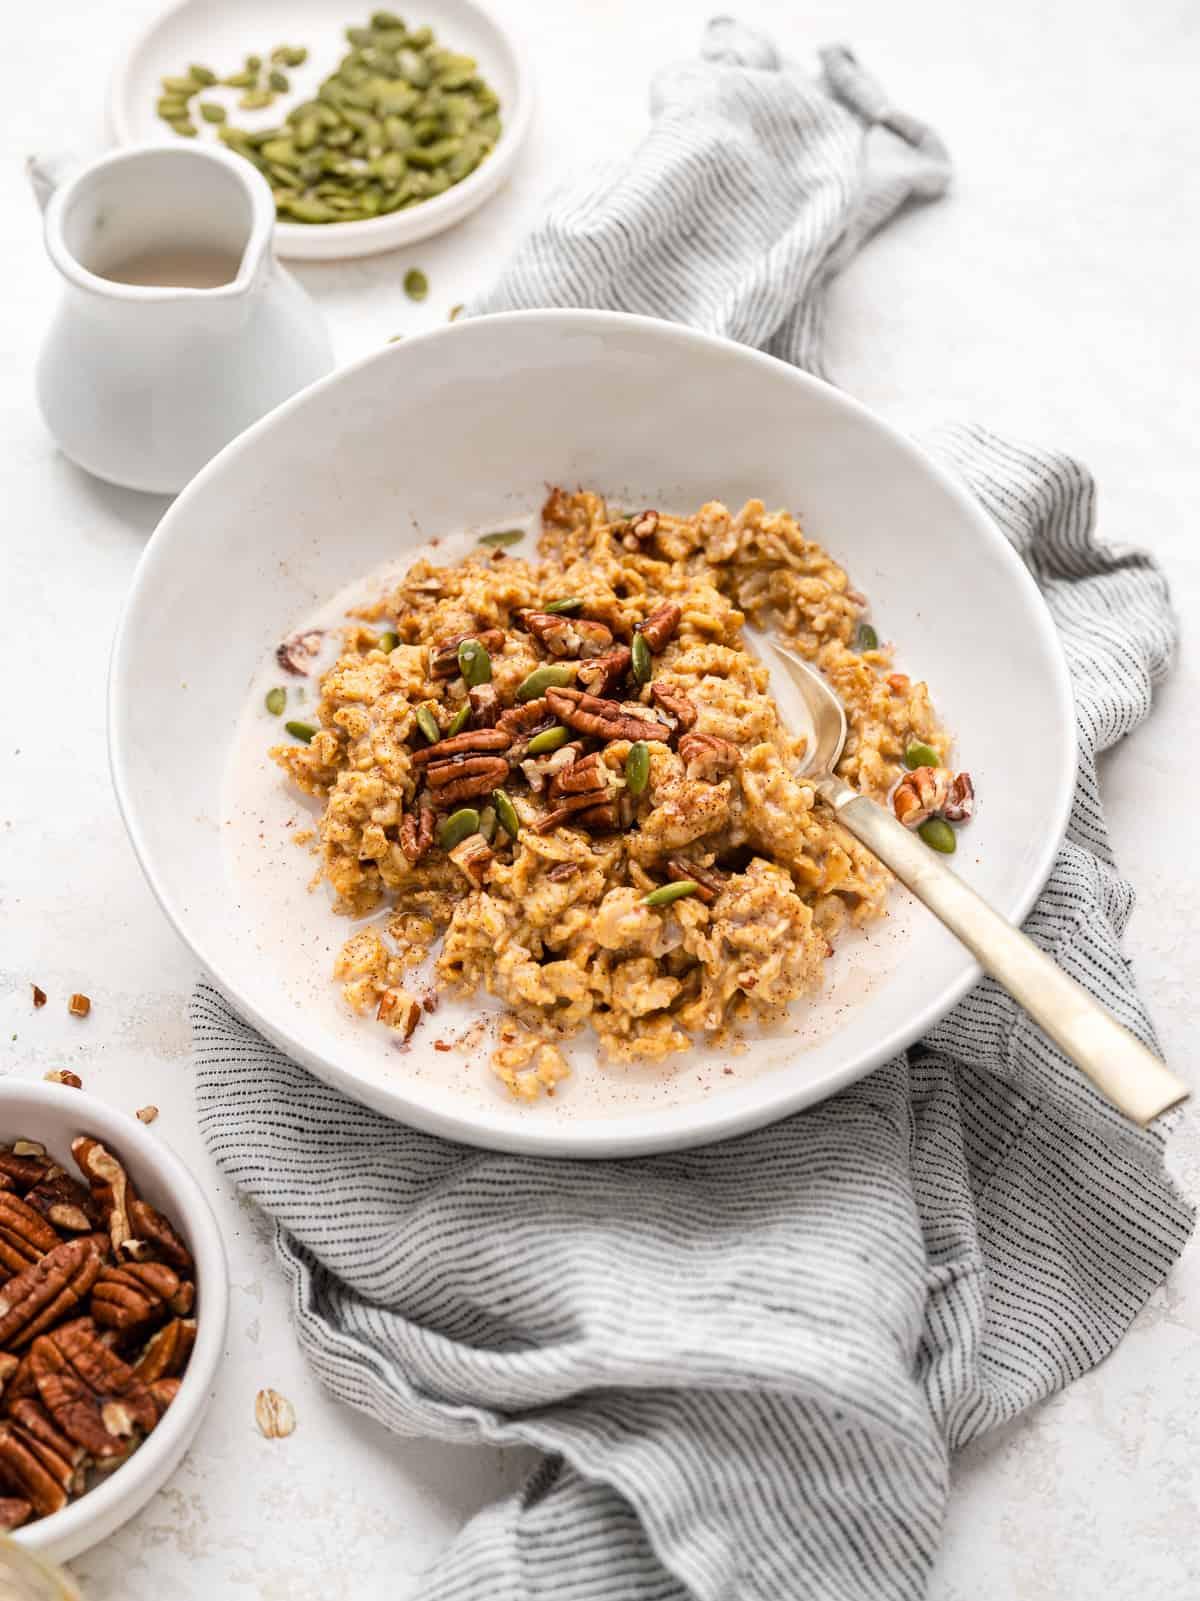 vegan pumpkin oatmeal in a bowl topped with heavy cream, pumpkin seeds, pecans, cinnamon.